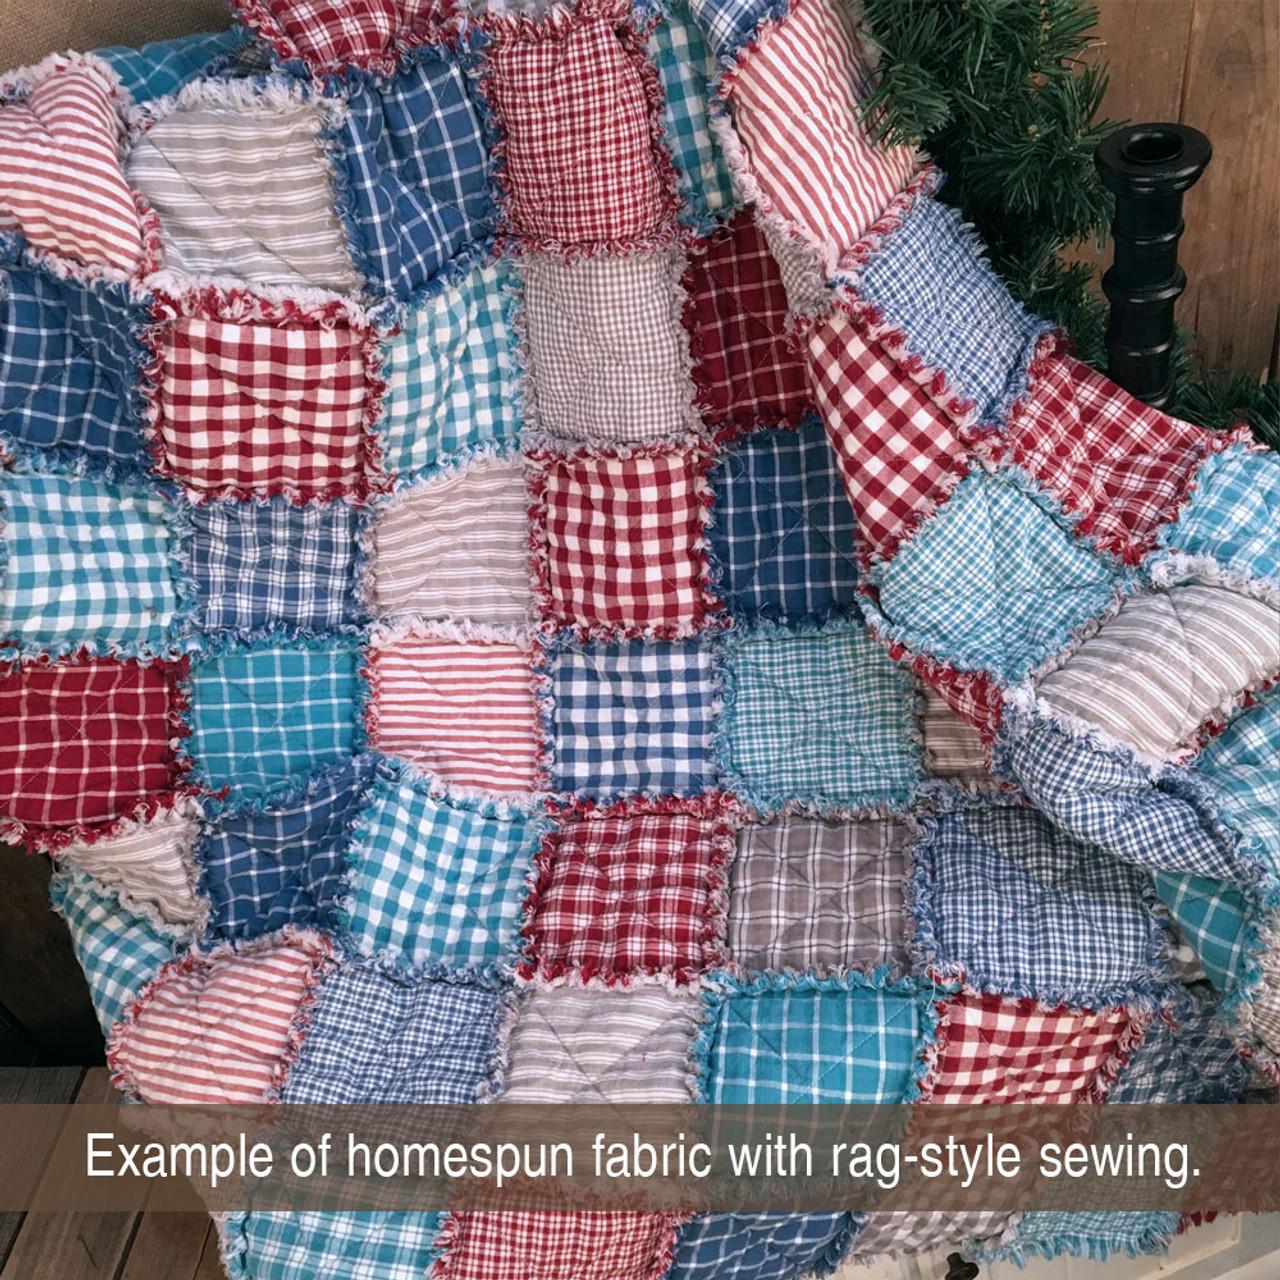 Liberty Red 2 Homespun Cotton Fabric